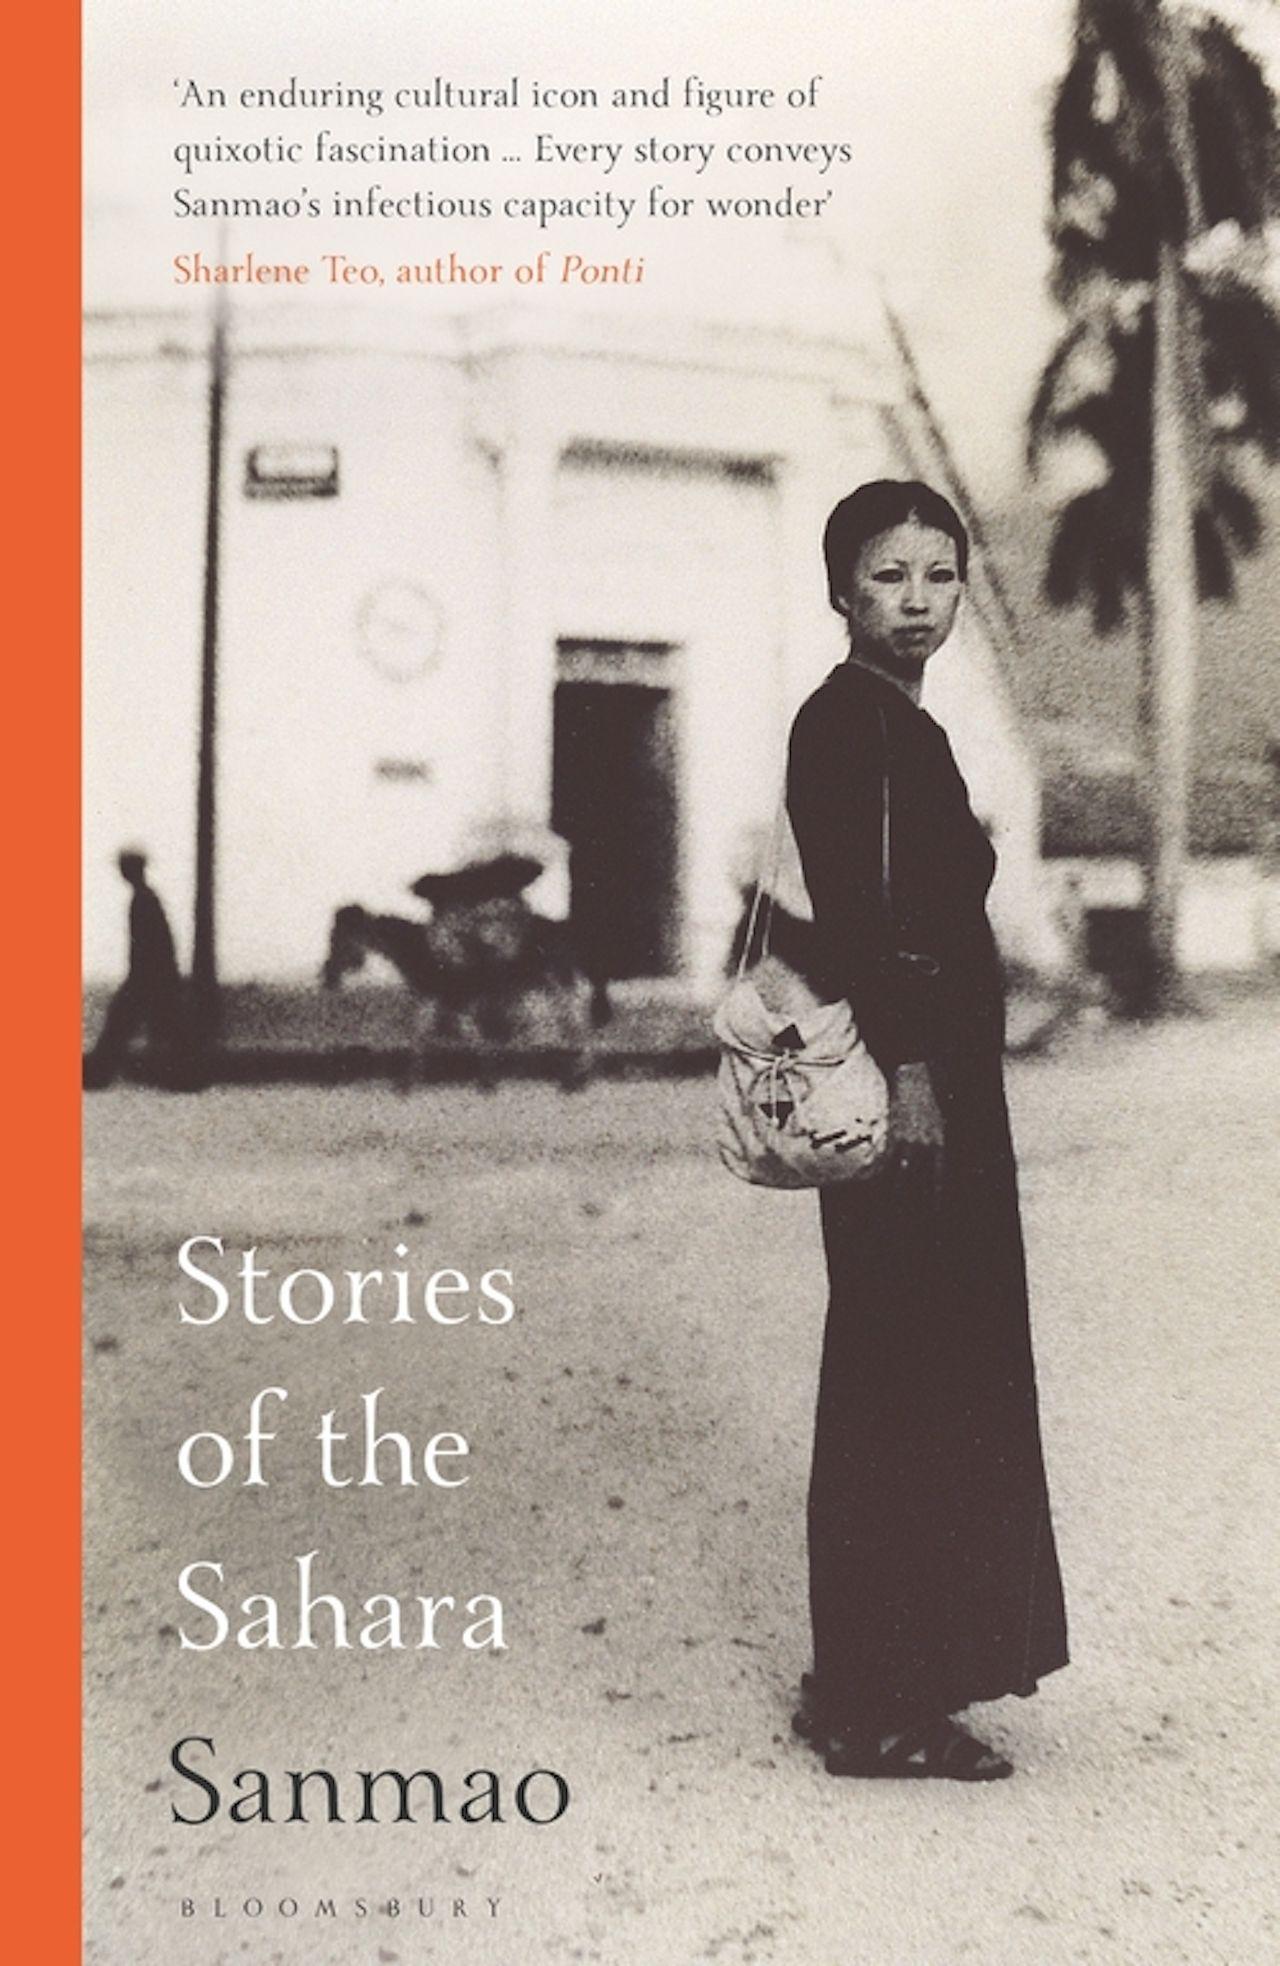 Stories of the Sahara travel books written by women